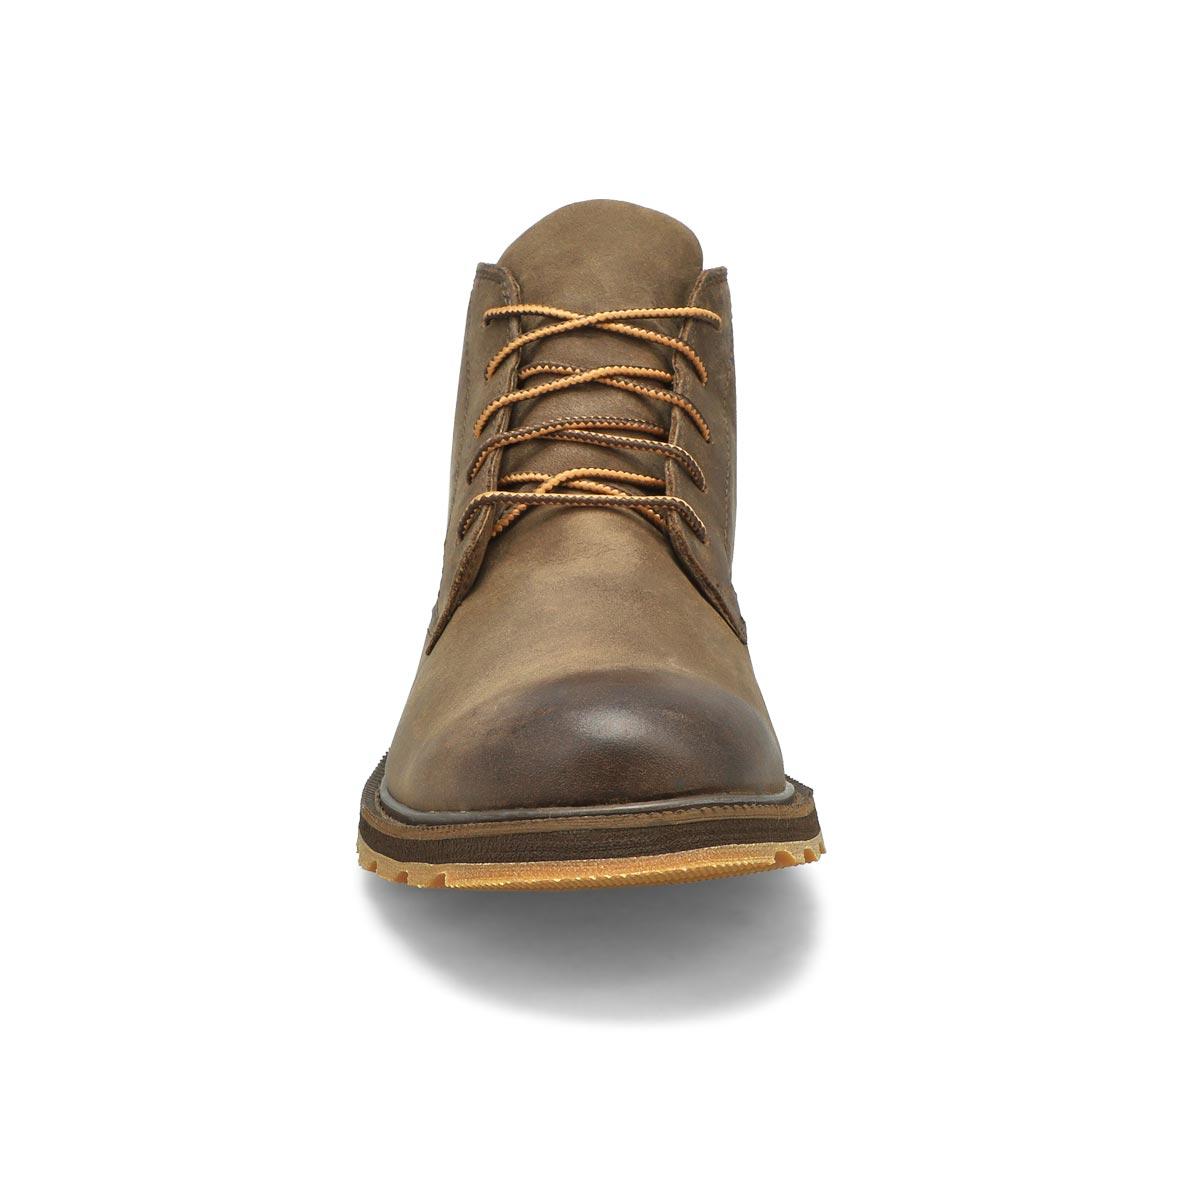 Mns Madson major wtpf chukka boot